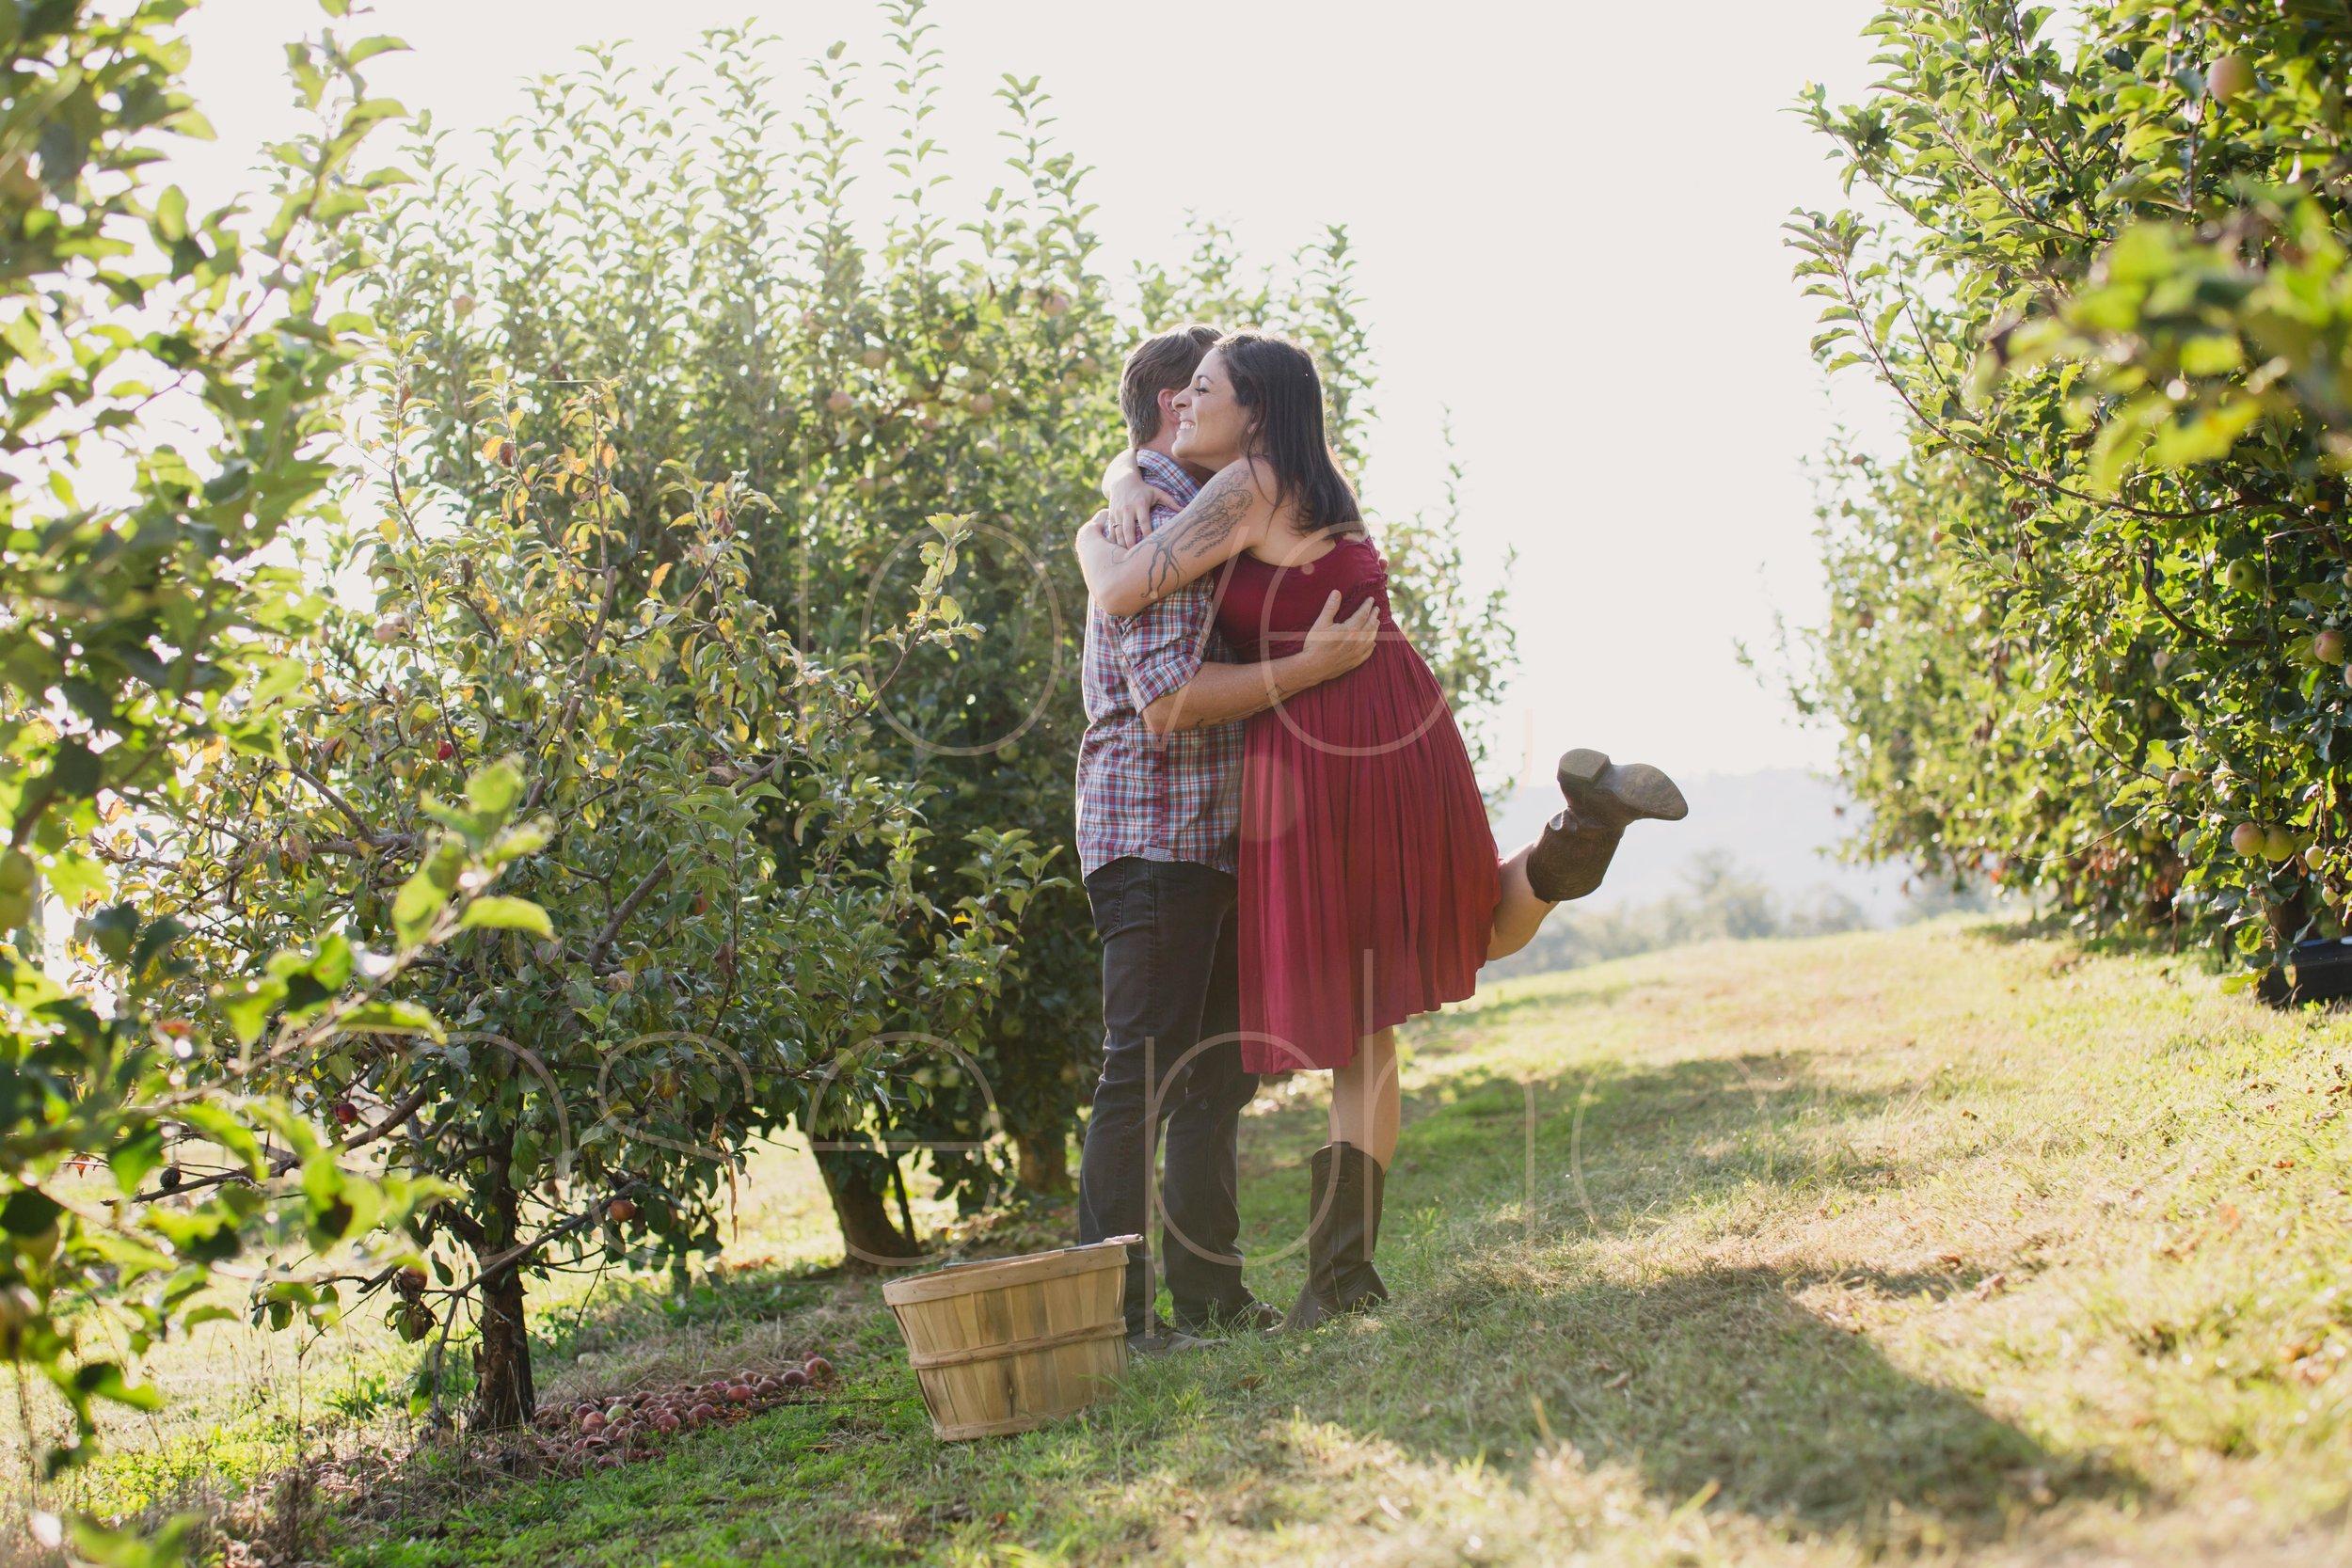 Jane Kramer Ashevegas Jason Sanford WNC Asheville wedding engagement shoot by Rose Photo-16.jpg